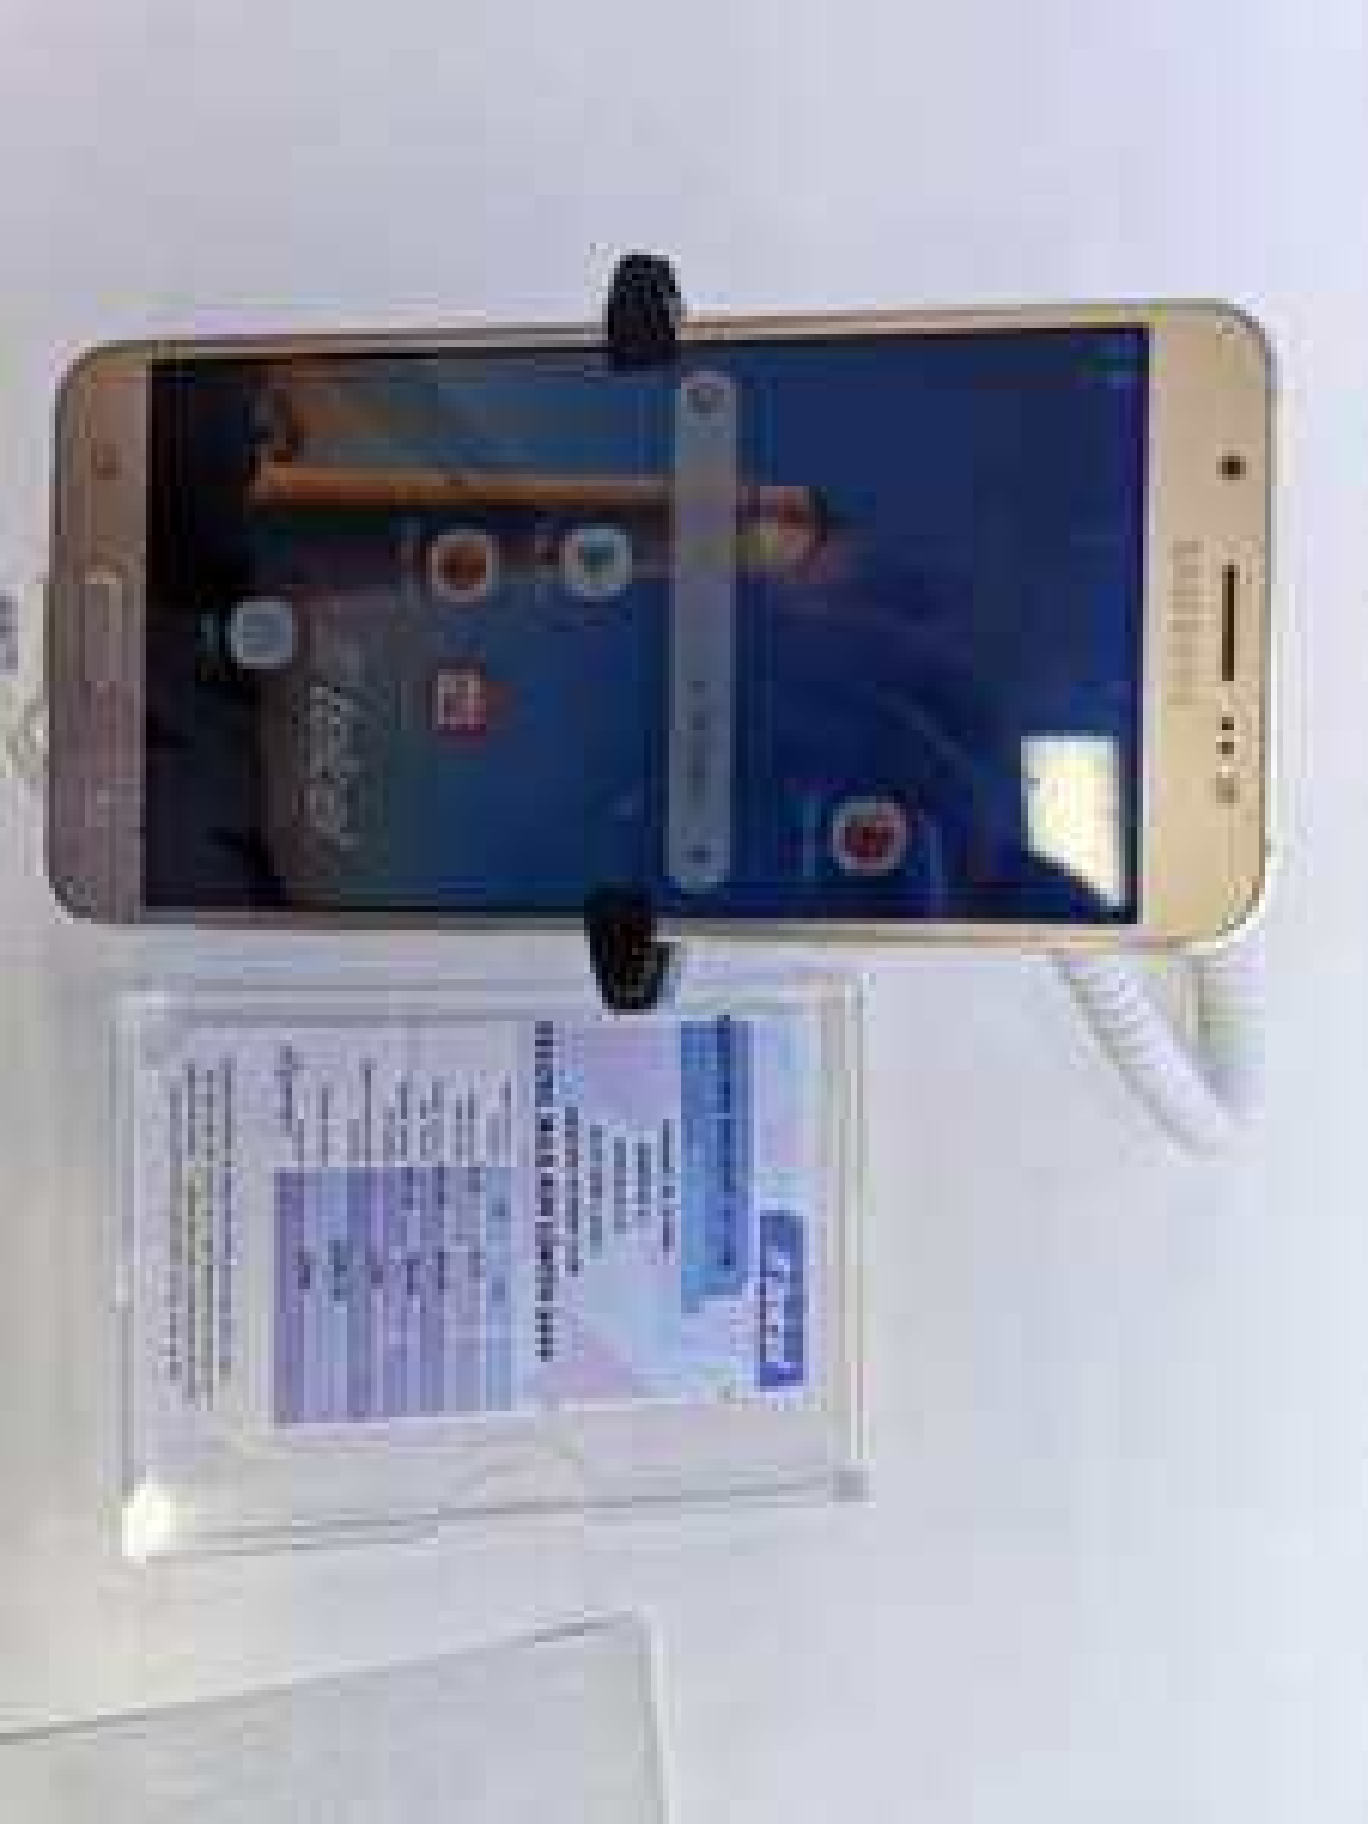 Telcel Contry Mty: Samsung Galaxy J7 LTE